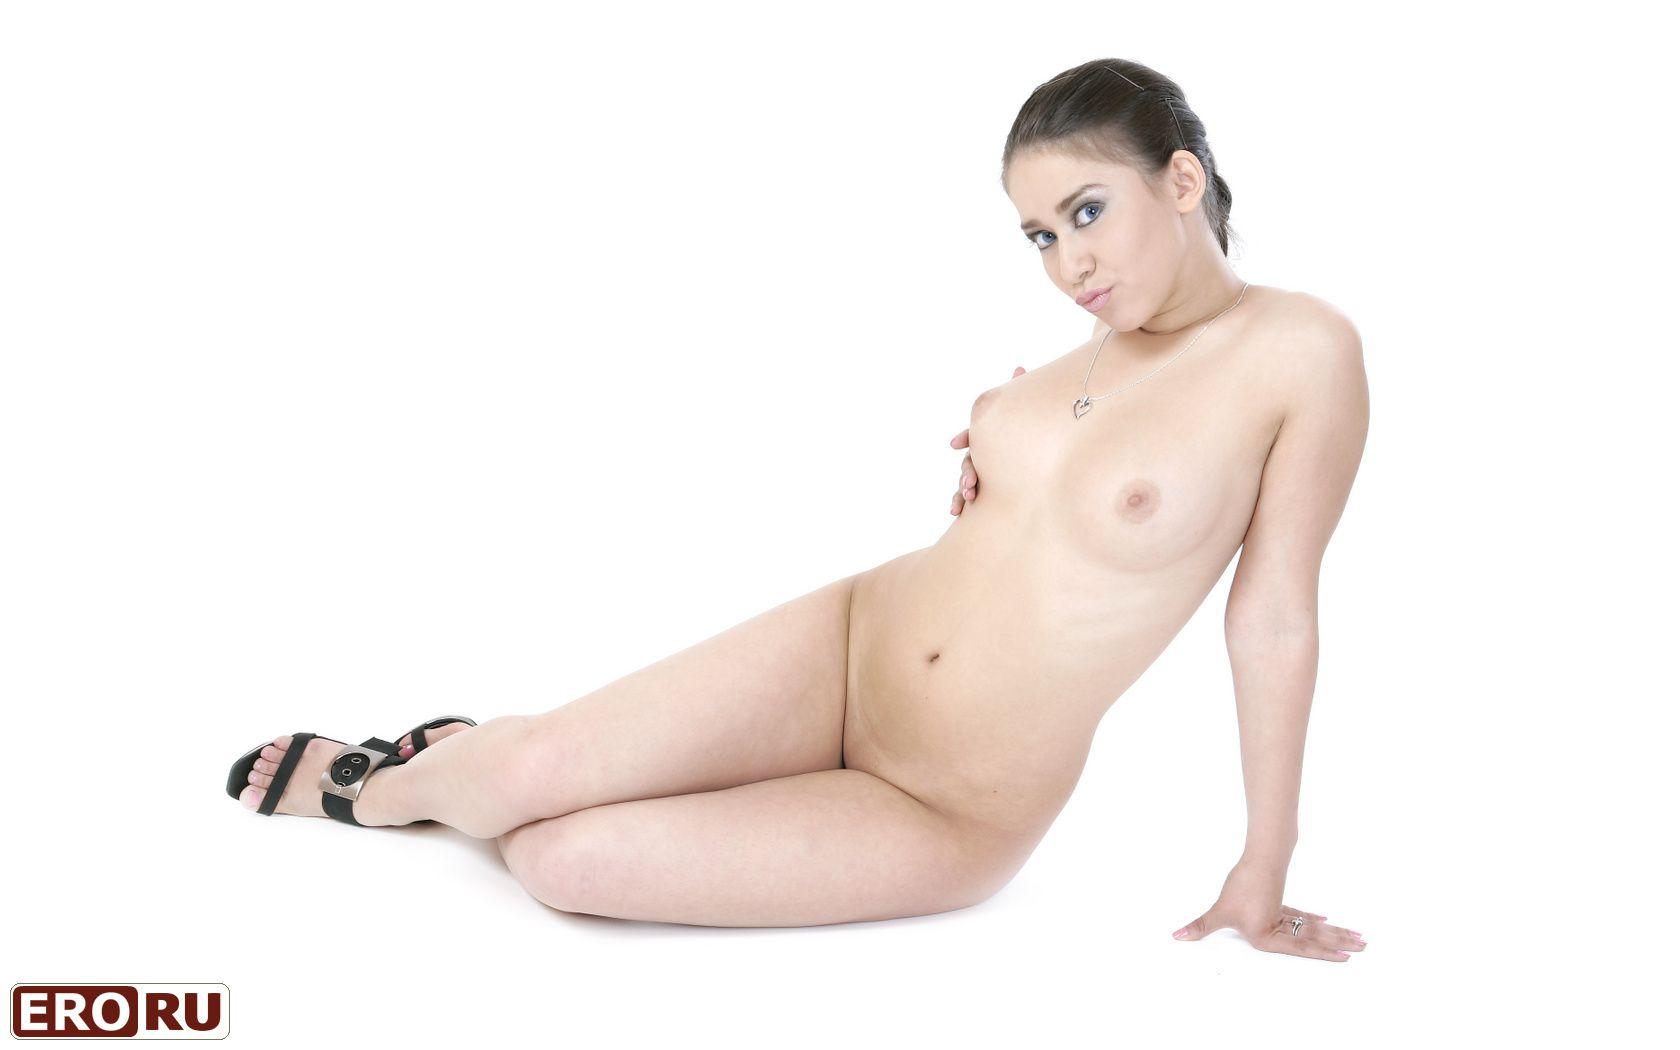 http://i1.imageban.ru/out/2010/08/02/8c12f21e5e71d808d607291f0a8f8519.jpg